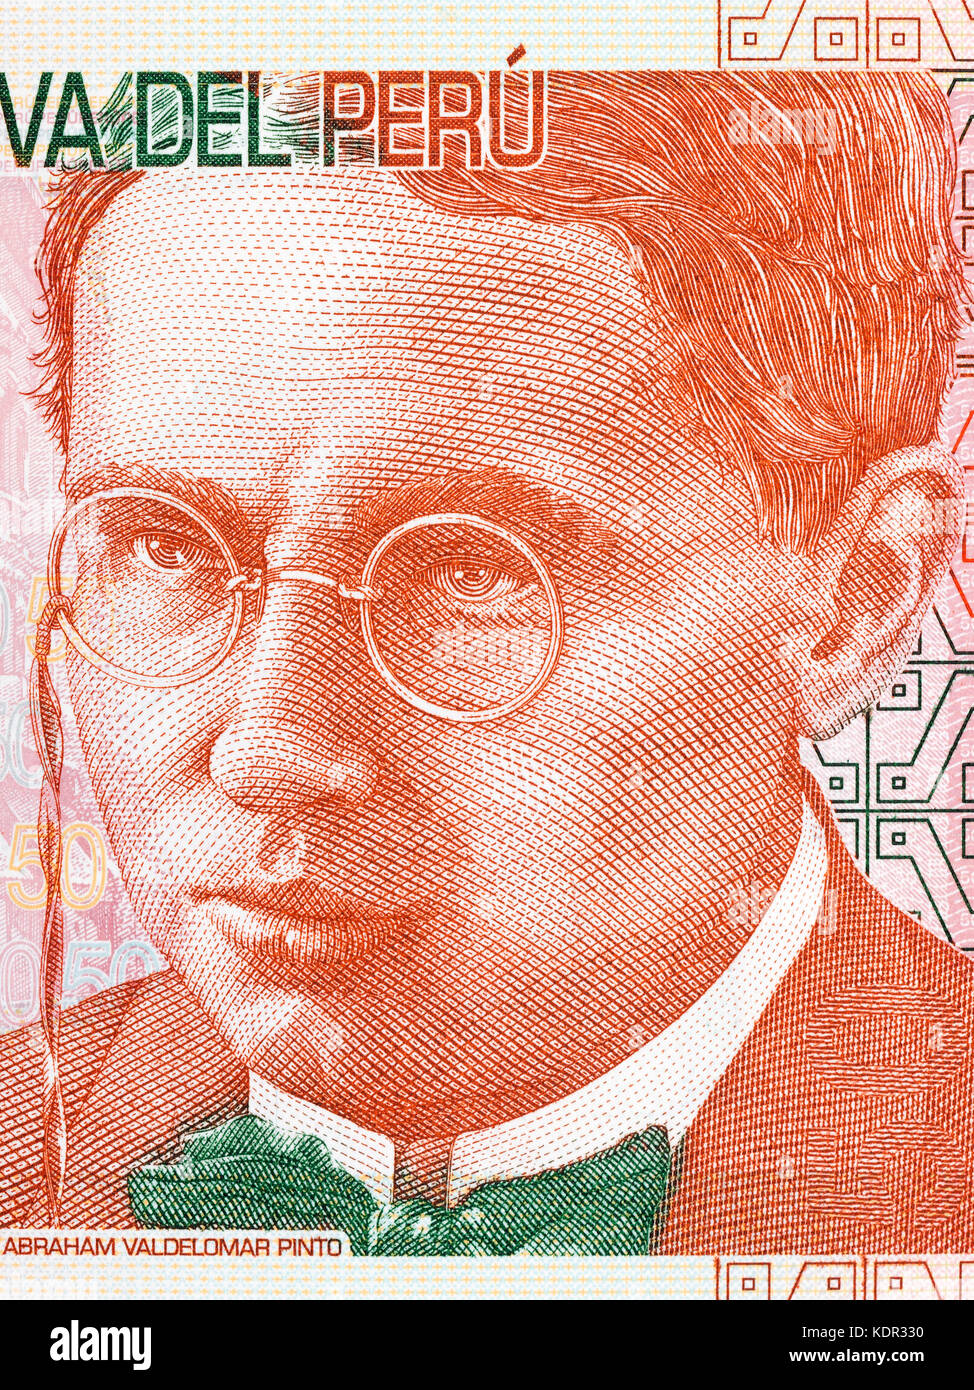 Abraham Valdelomar portrait from Peruvian money - Stock Image